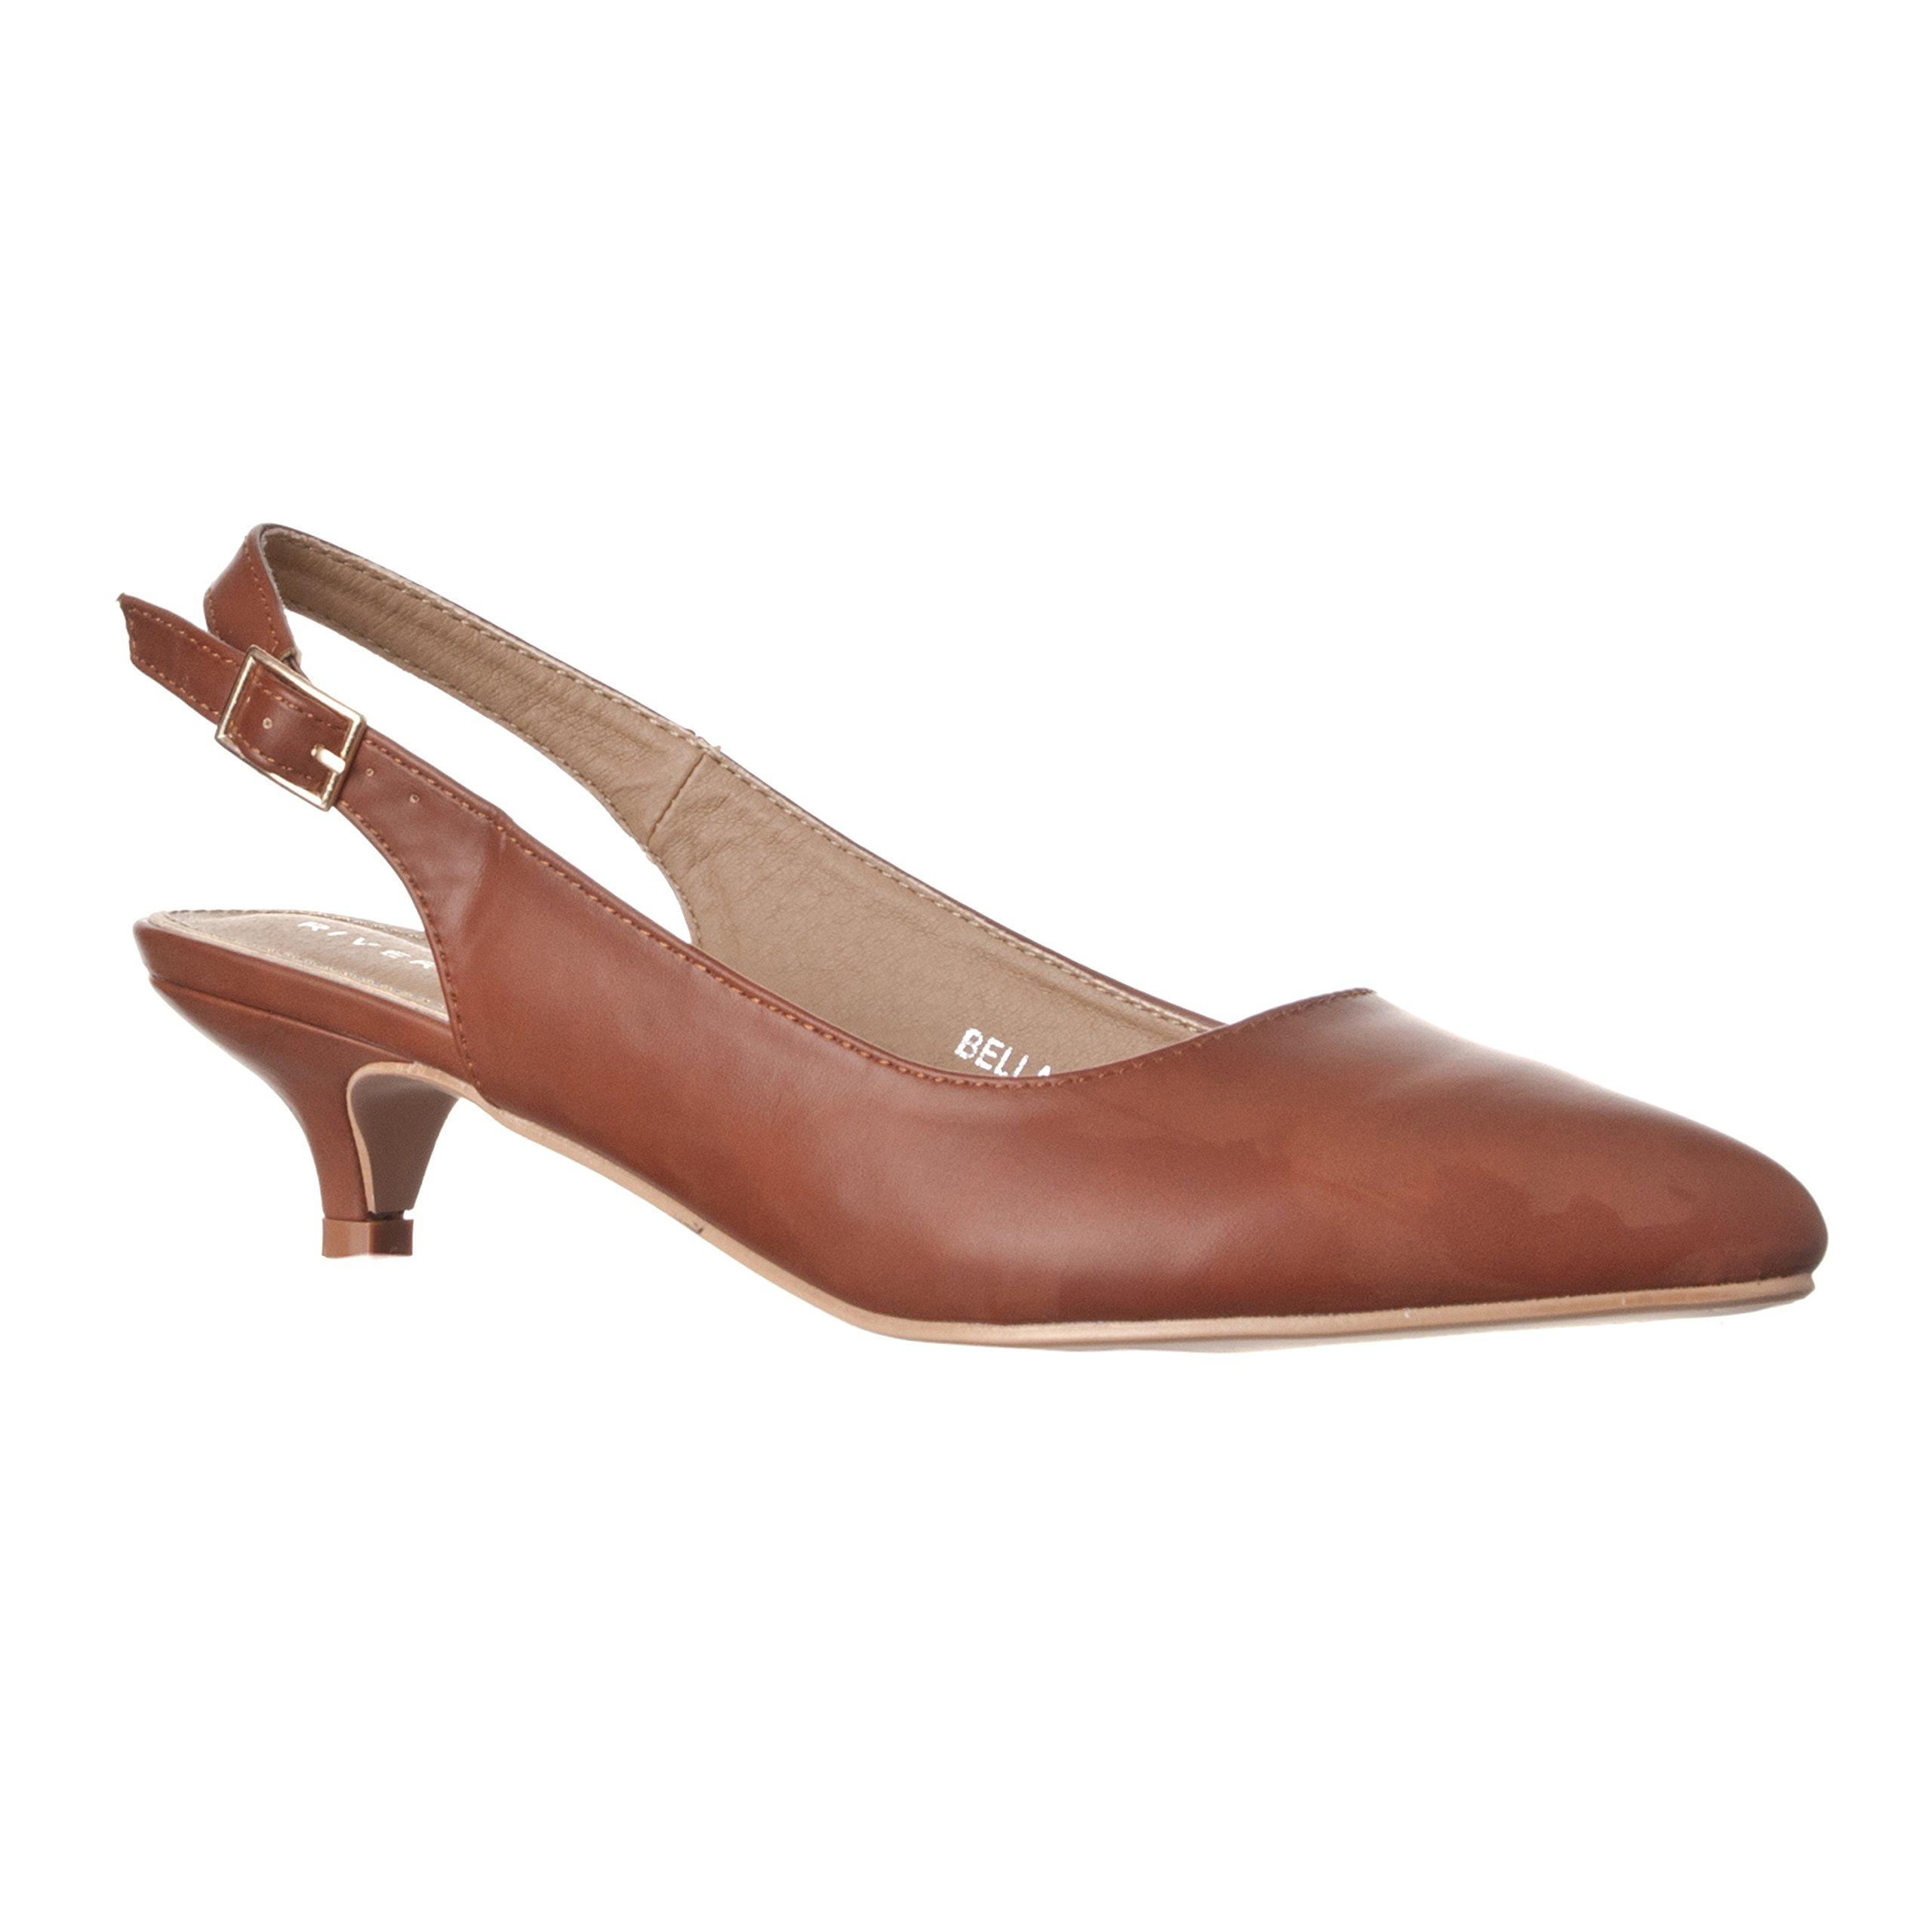 Riverberry Women's Bella Pointed Toe Sling Back Low-Height Pump Heels, Brown PU, 7